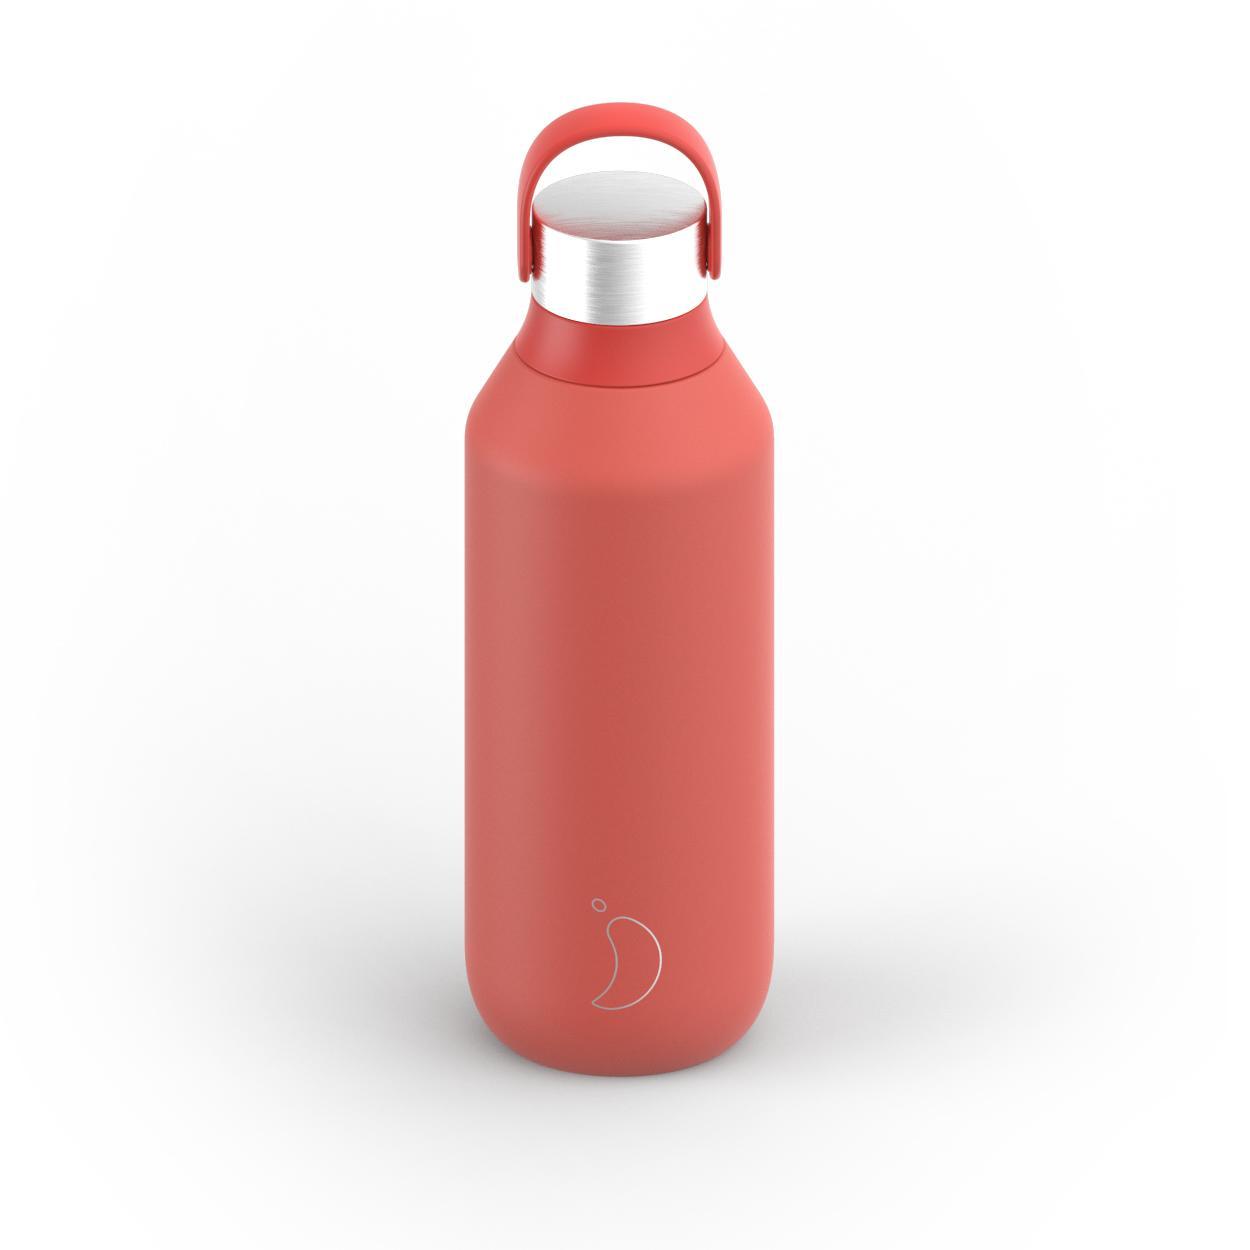 Botella Chilly´s serie 2 color rojo 500 ml.